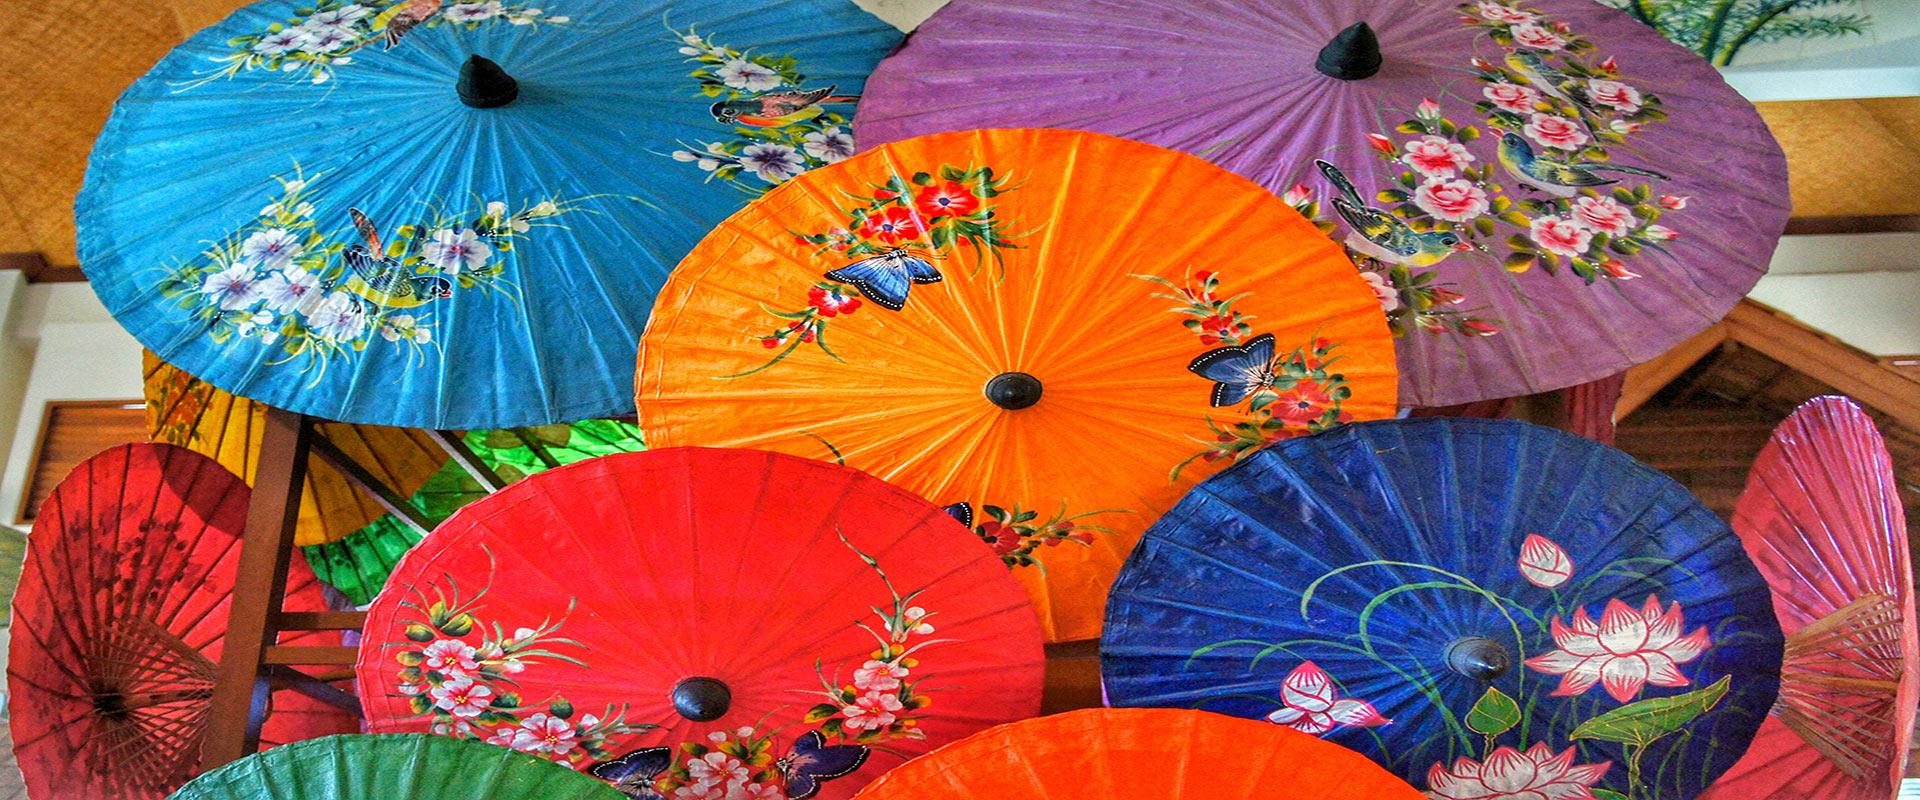 ombrelles colorées chiang mai Thaïlande